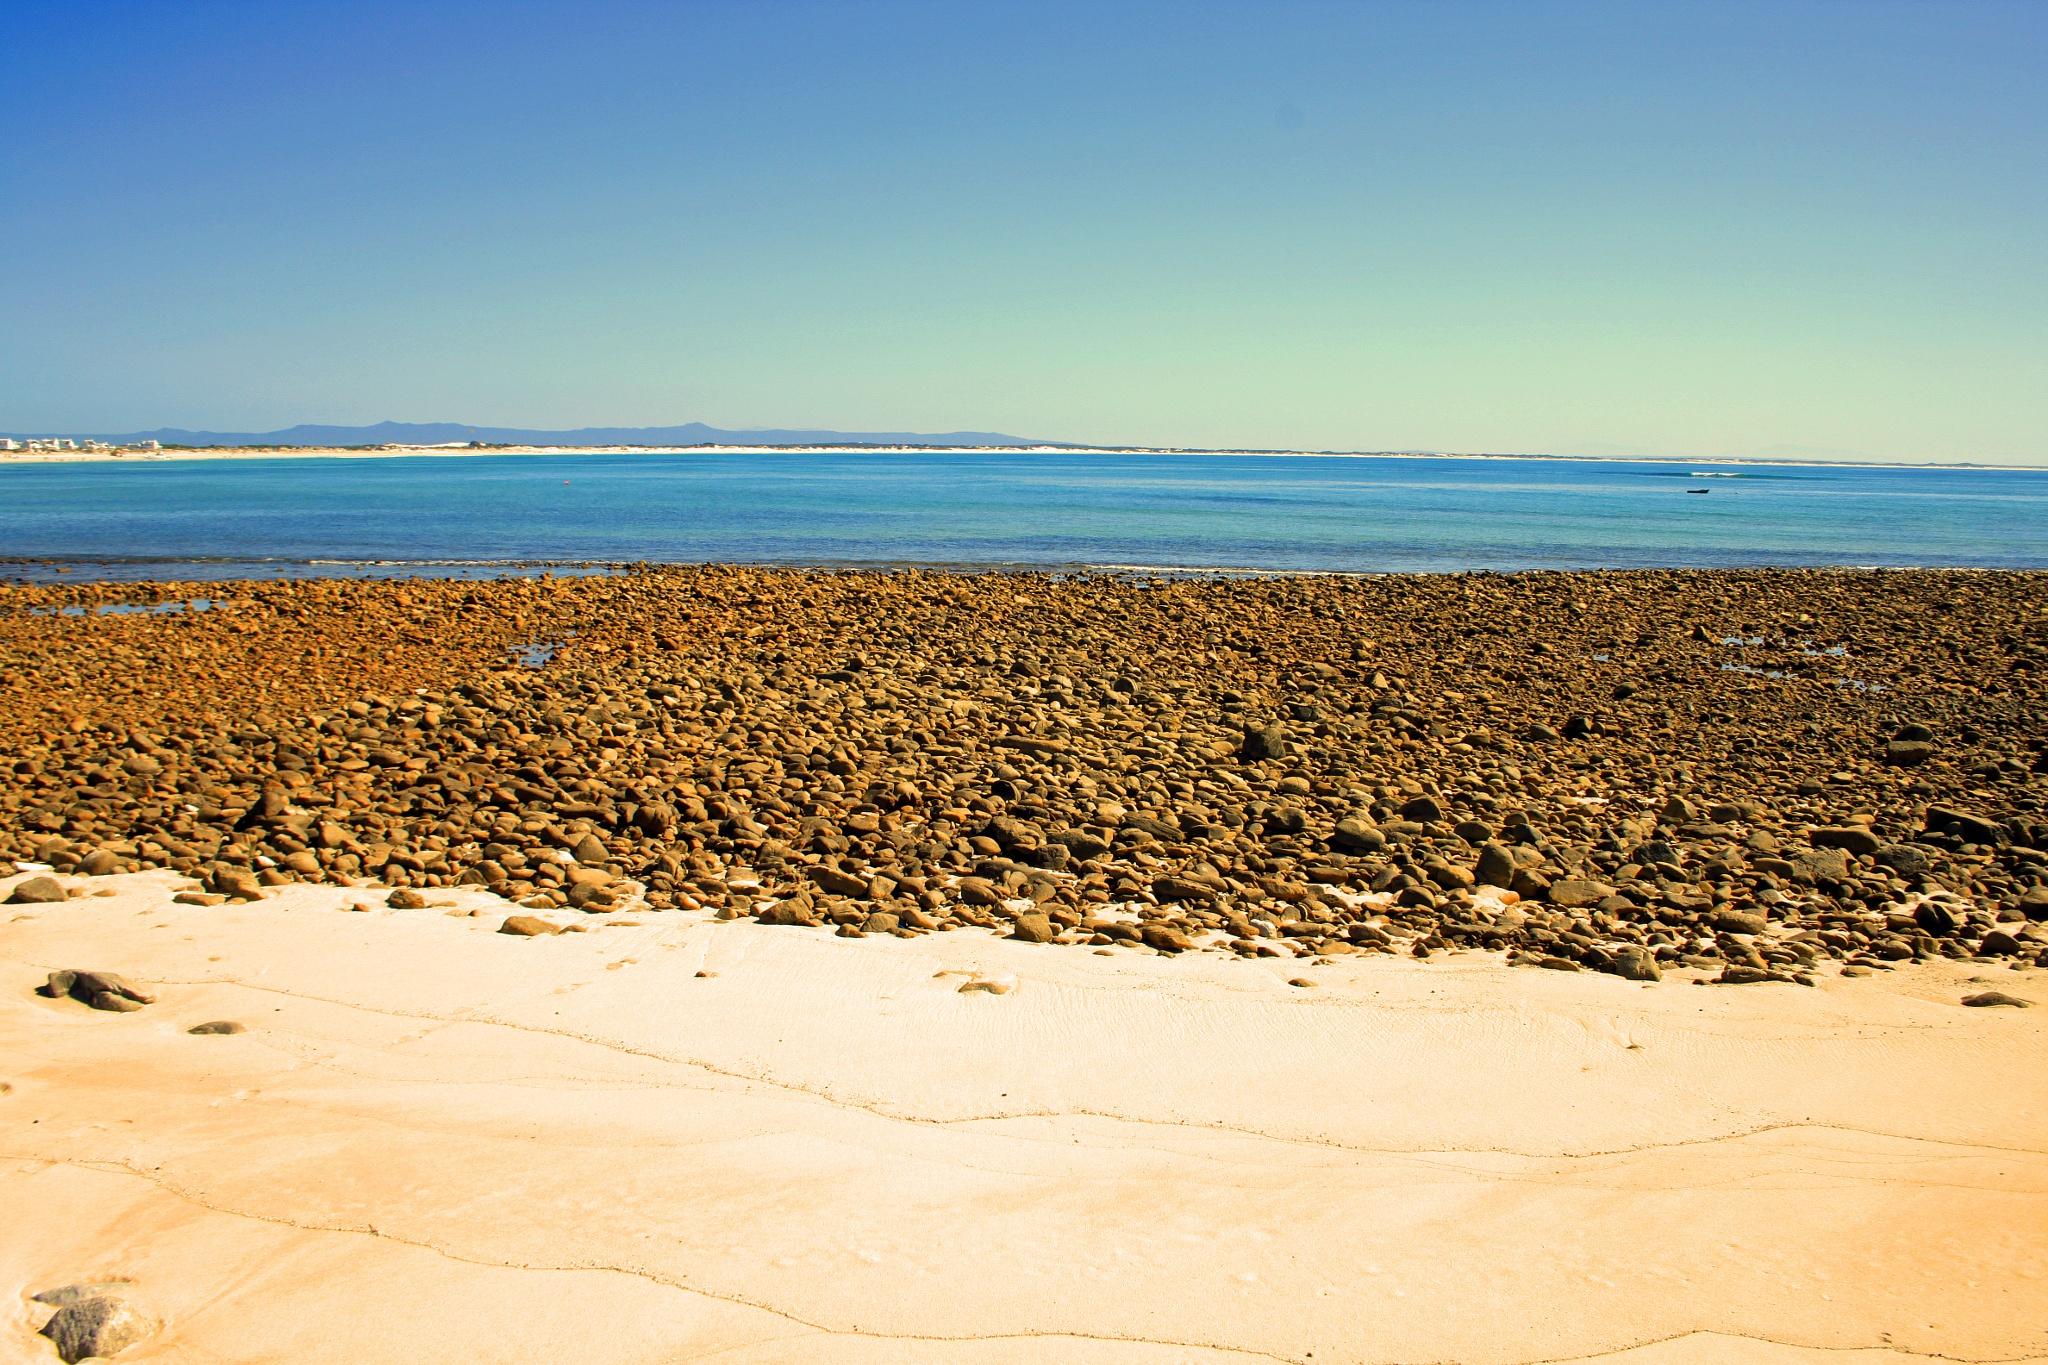 stoney shore by Nauta Piscatorque